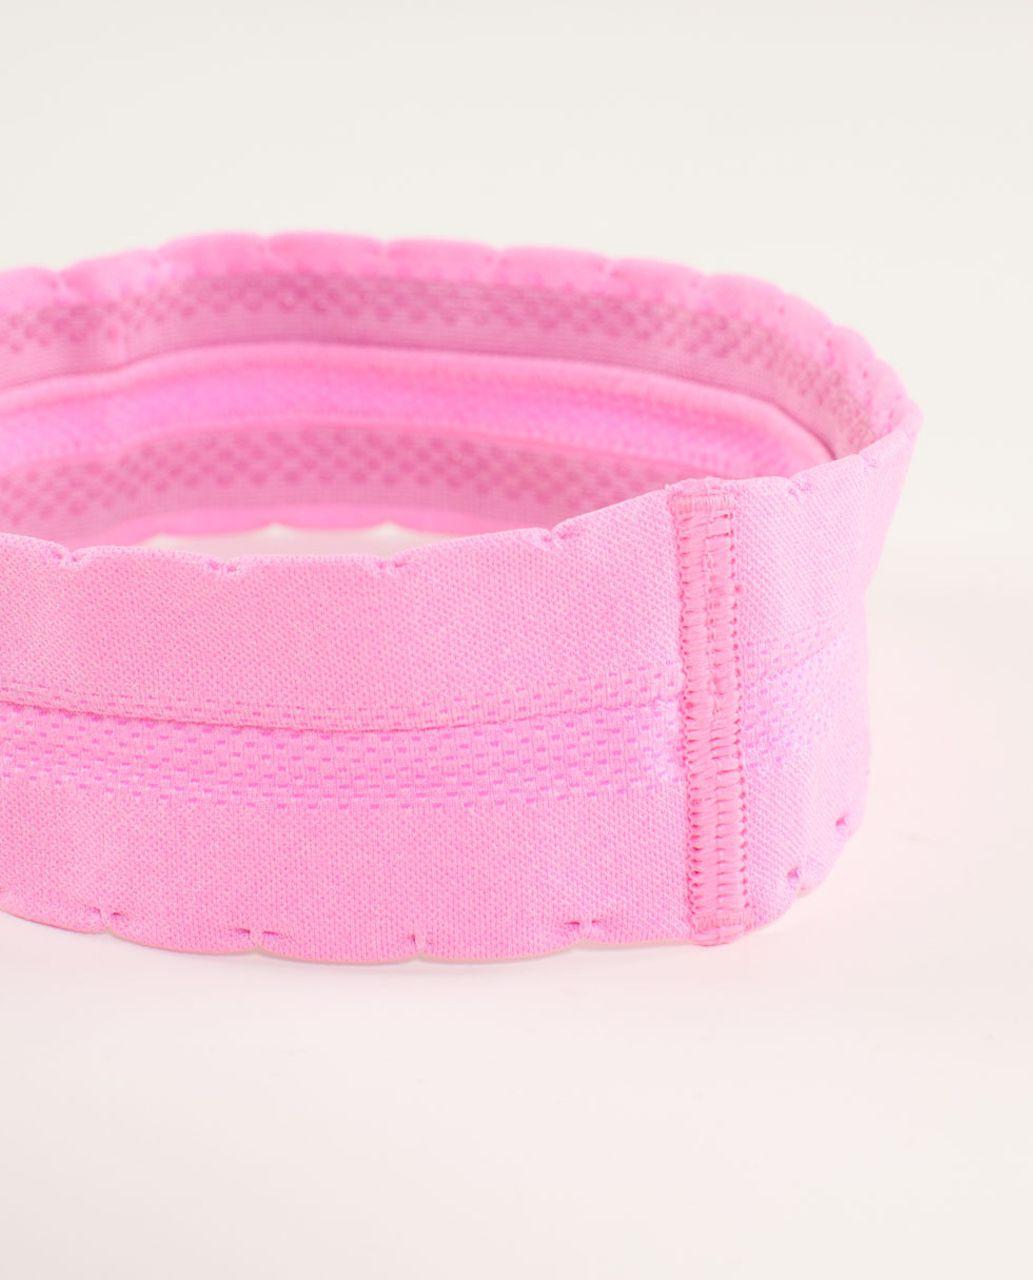 Lululemon Swiftly Headband - Raspberry Glo Light